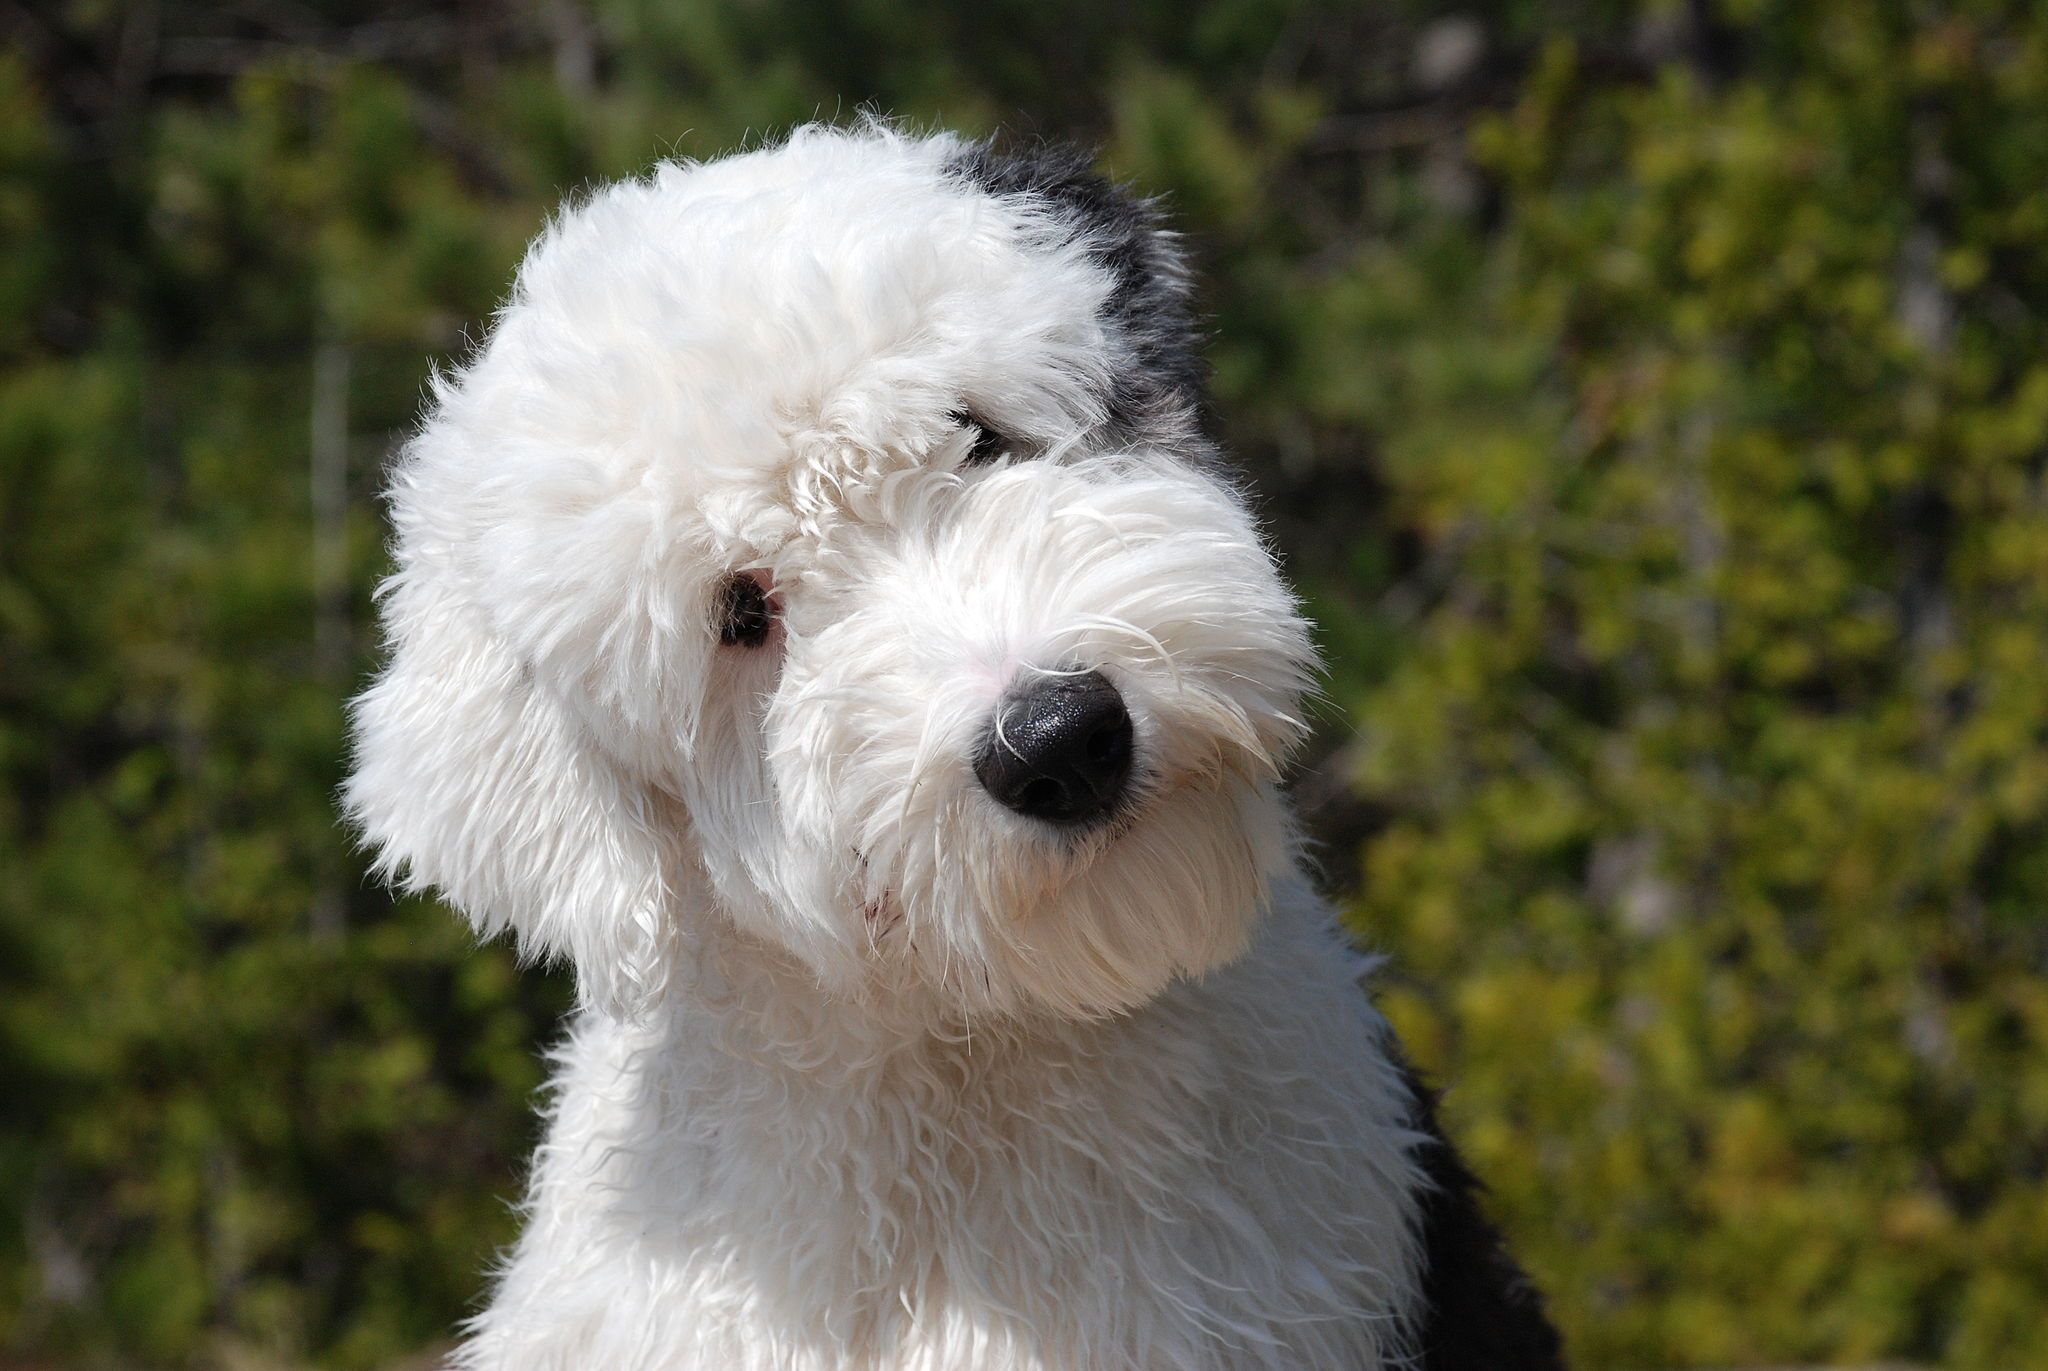 Old English Sheep Dog Dogs I Want English Sheepdog Puppy